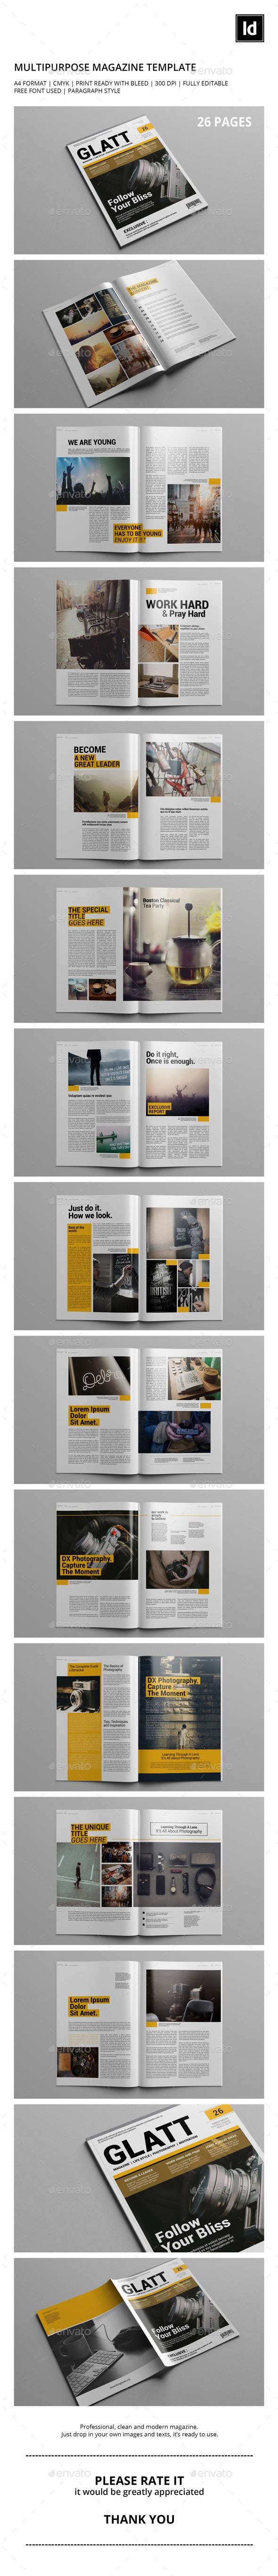 GraphicRiver GLATT Multipurpose Magazine Template 11463247